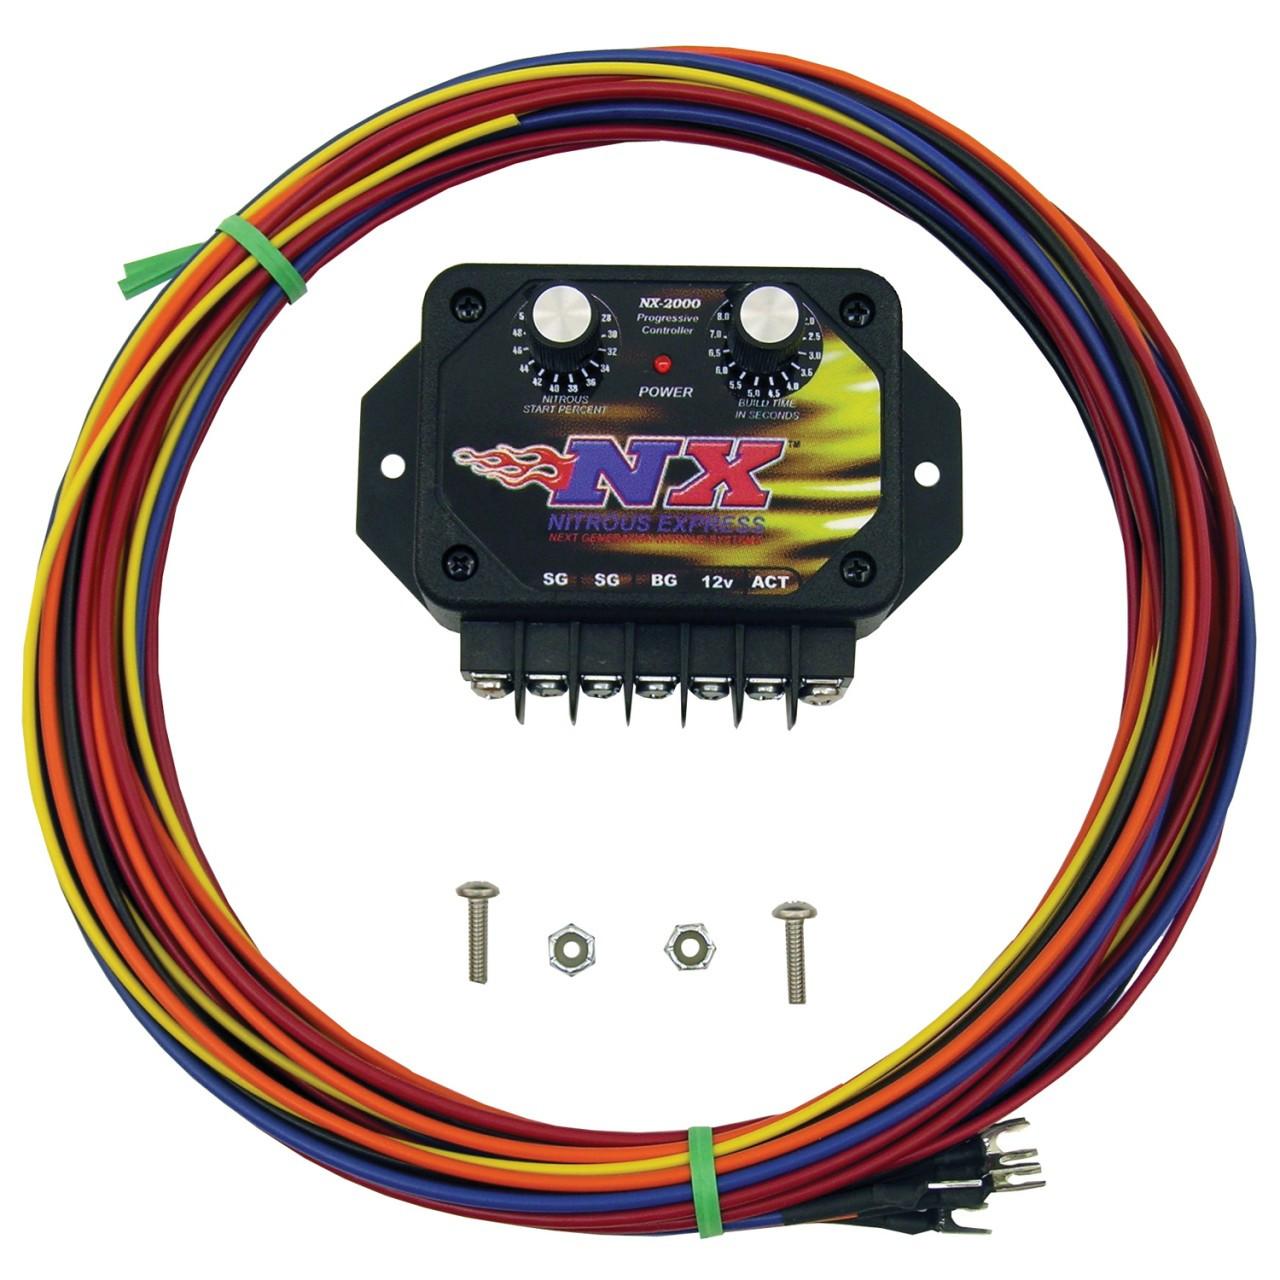 edelbrock nitrous controller wiring diagram for wiring. Black Bedroom Furniture Sets. Home Design Ideas